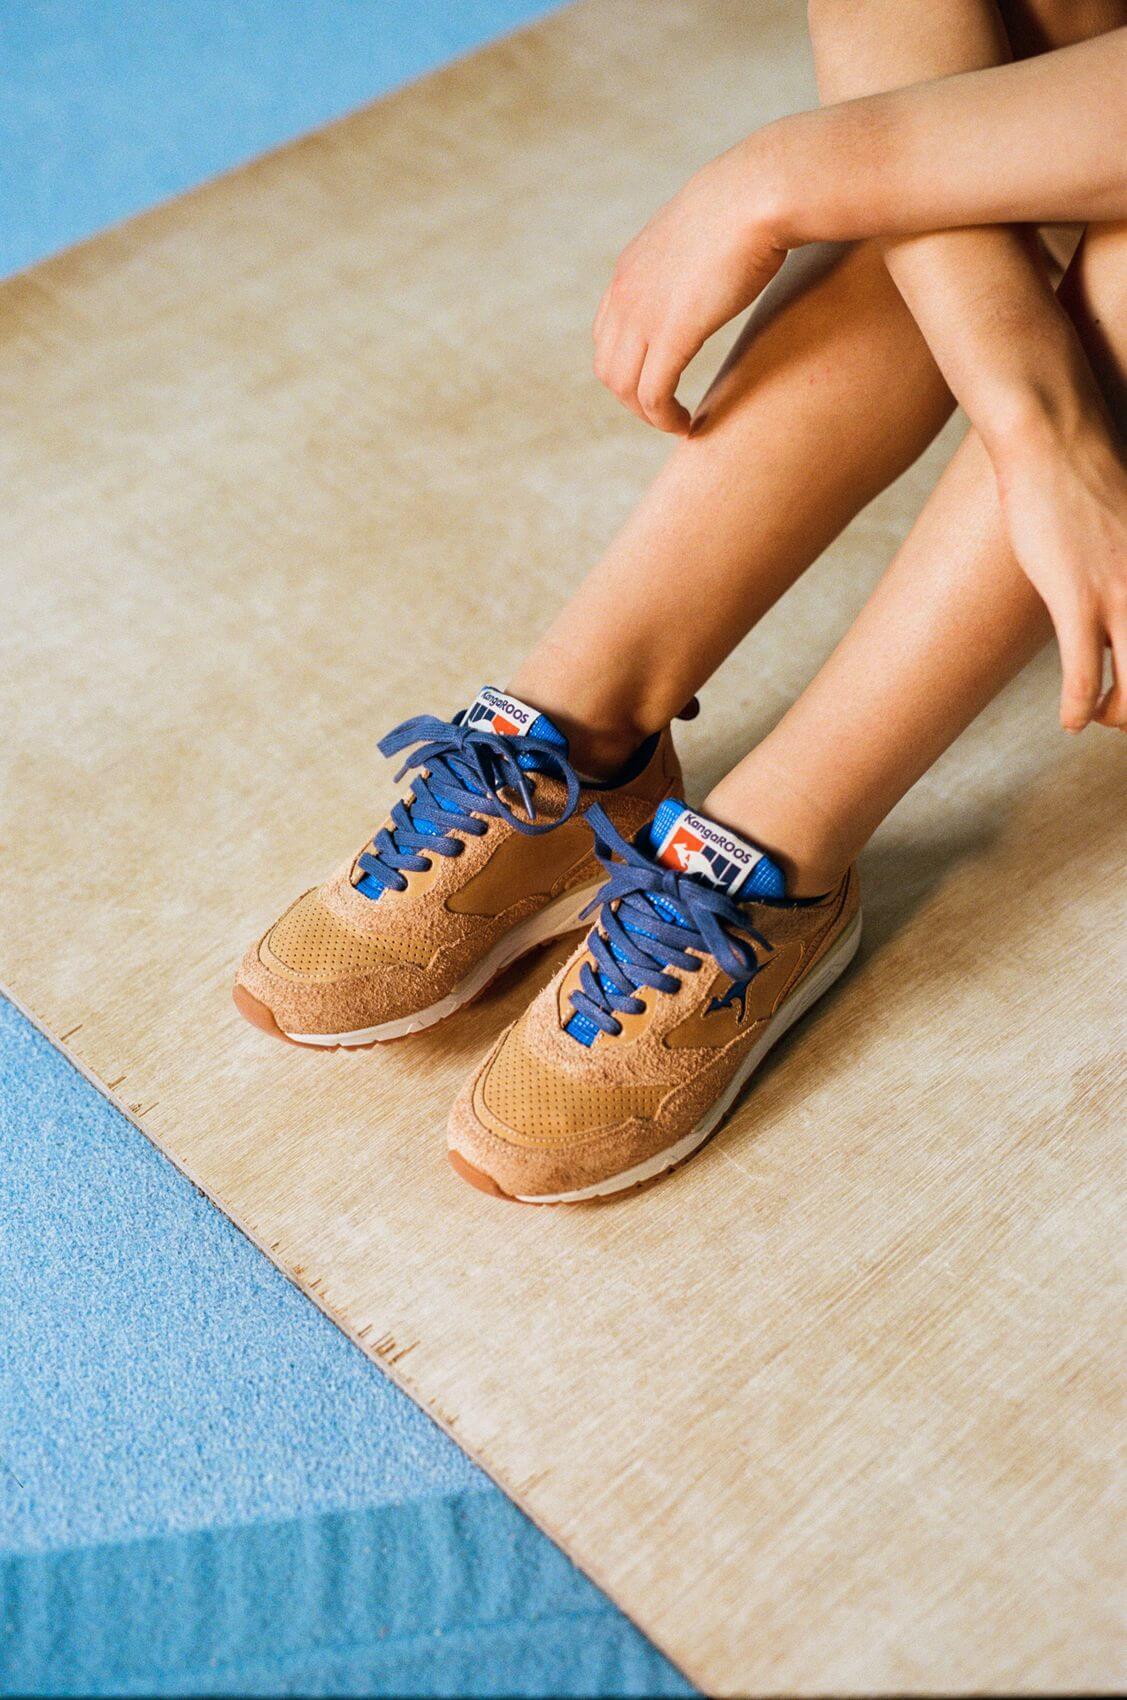 on feet - the KangaROOS x DTB(Deutscher Turner-Bund) - The DTB - brown/blue